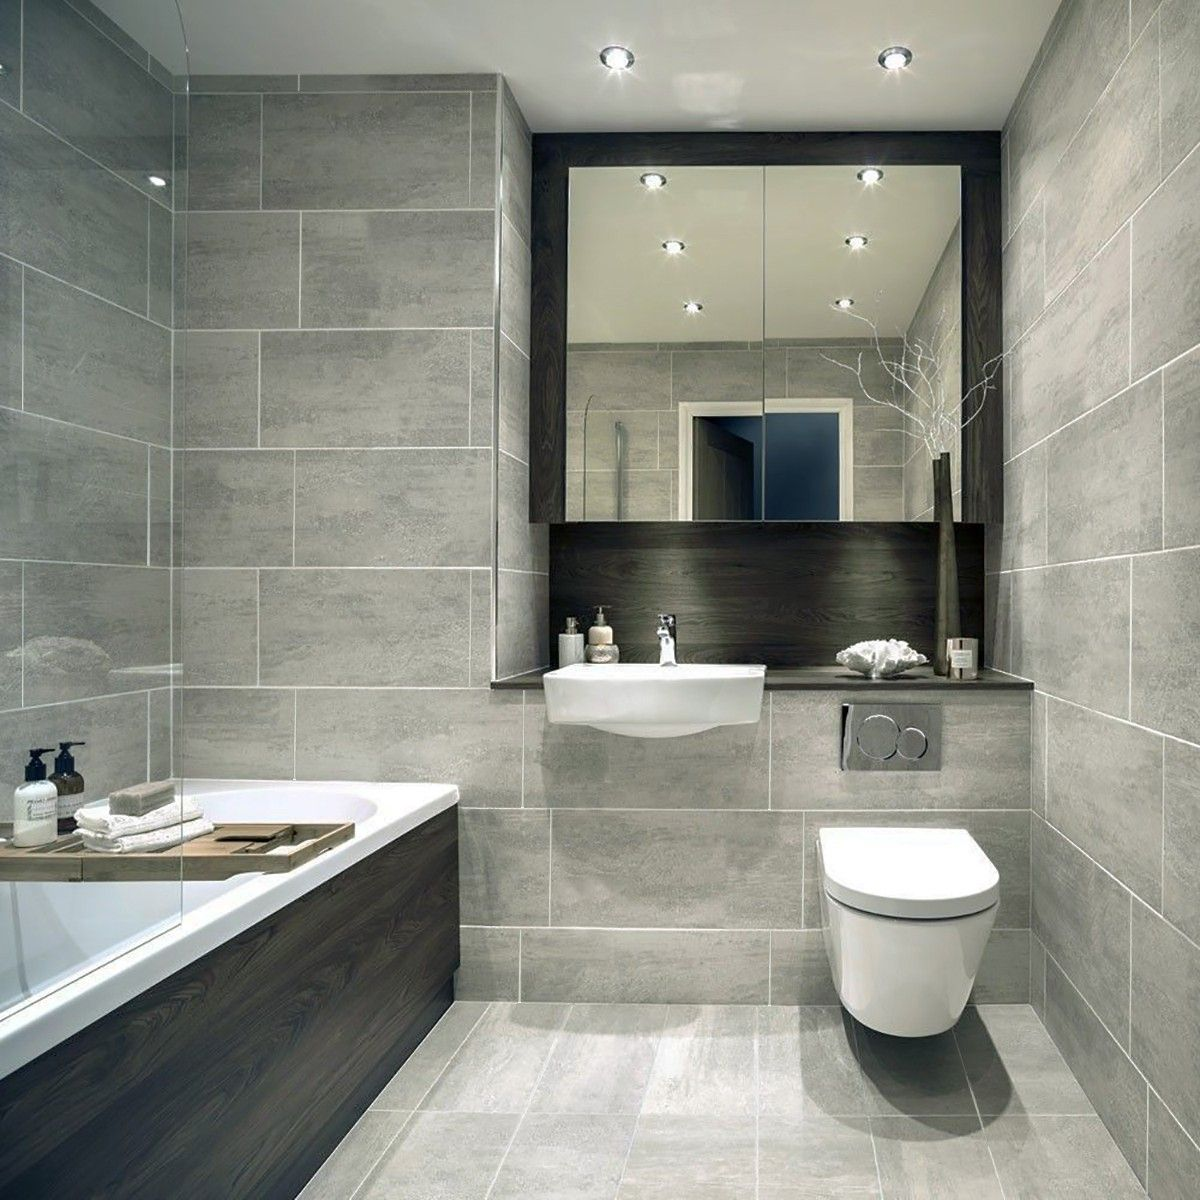 Indiana Grey Porcelain Wall Floor Tiles Grey Bathroom Floor Grey Bathroom Tiles Bathroom Interior Design